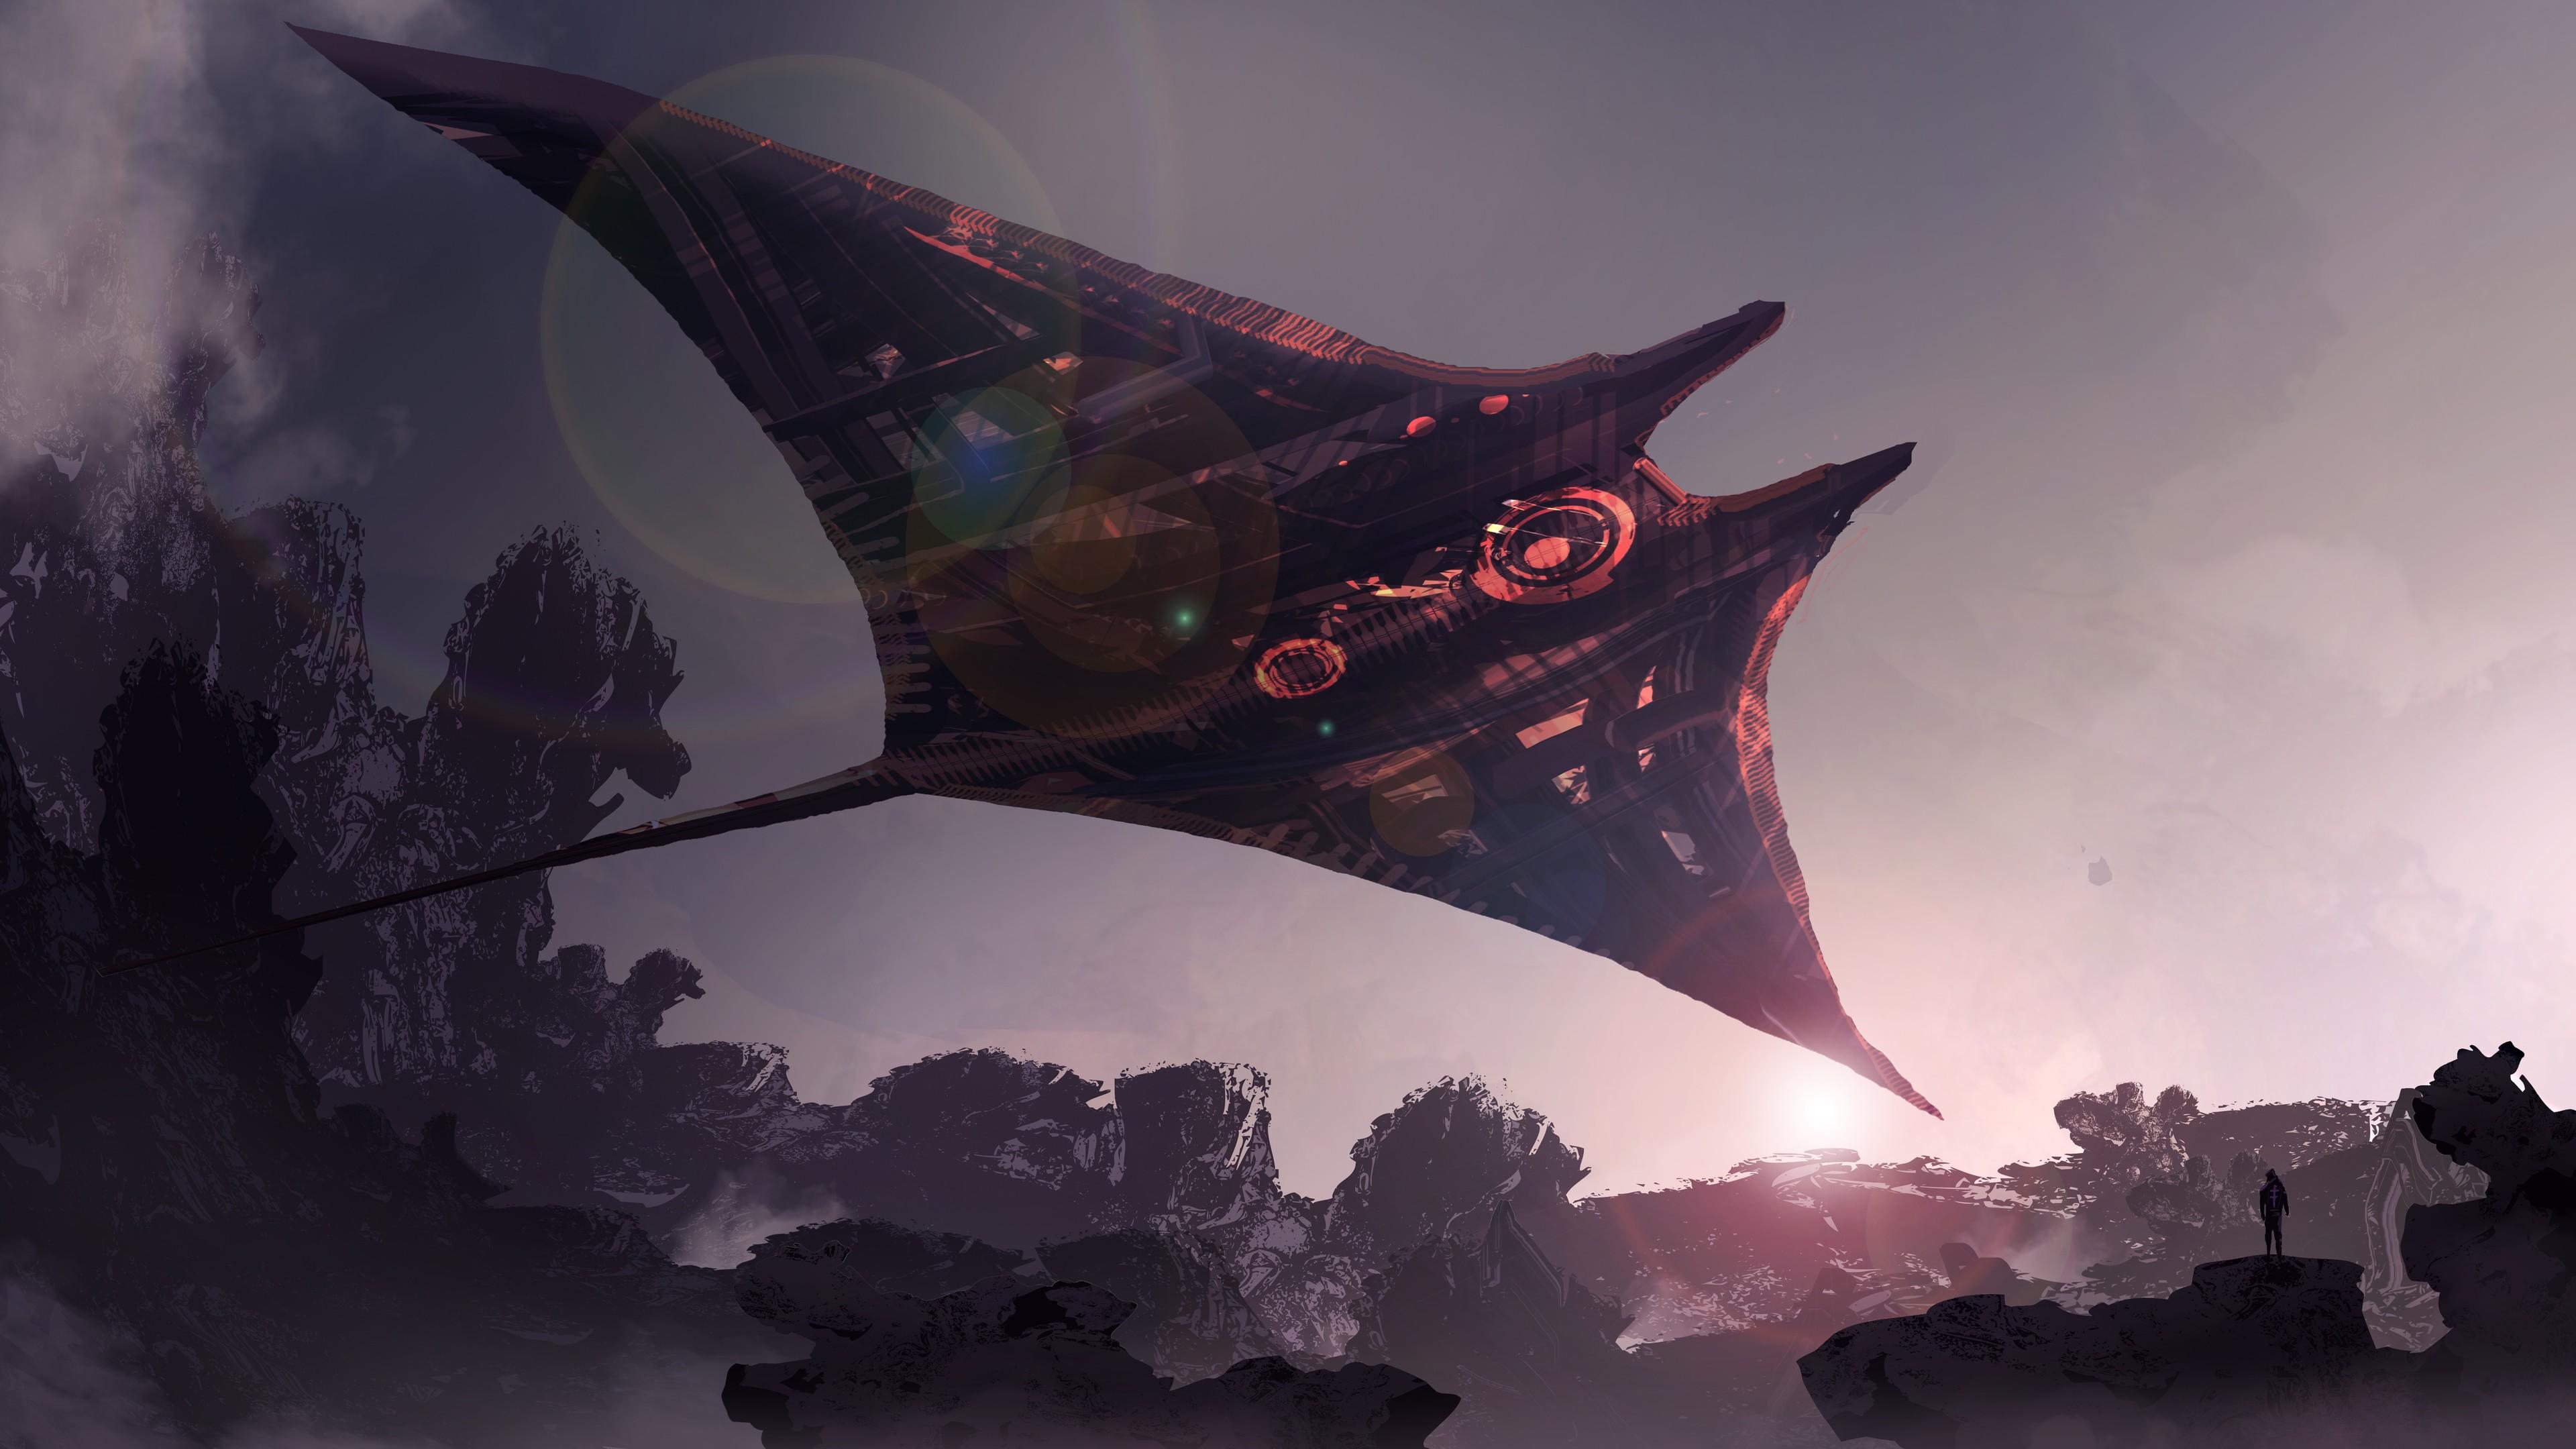 futuristic spaceship science fiction digital art 4k 1540751283 - Futuristic Spaceship Science Fiction Digital Art 4k - spaceship wallpapers, hd-wallpapers, digital art wallpapers, deviantart wallpapers, artwork wallpapers, artistic wallpapers, 4k-wallpapers